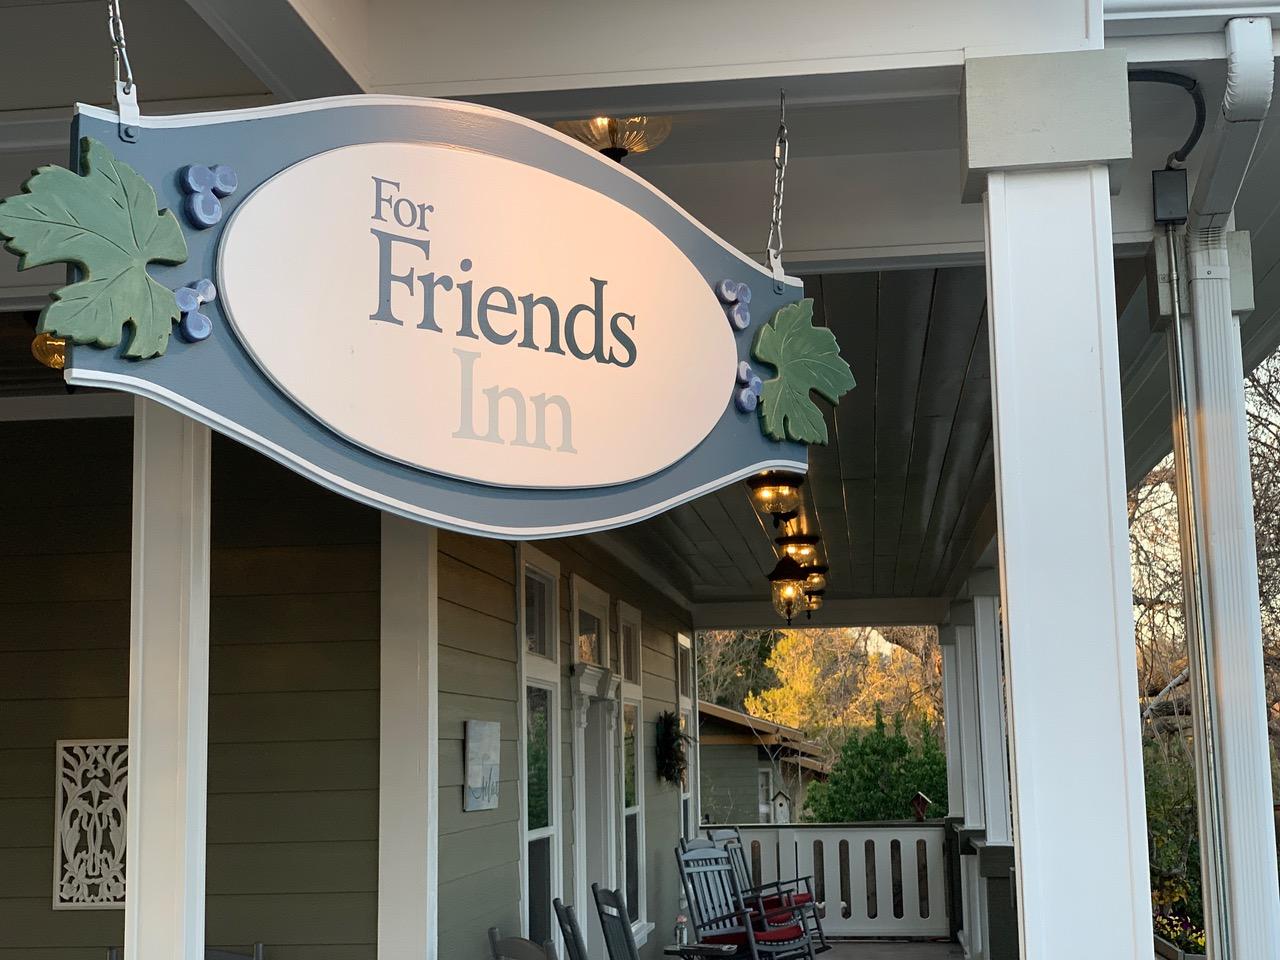 ForFriends Inn signage | ForFriends Inn